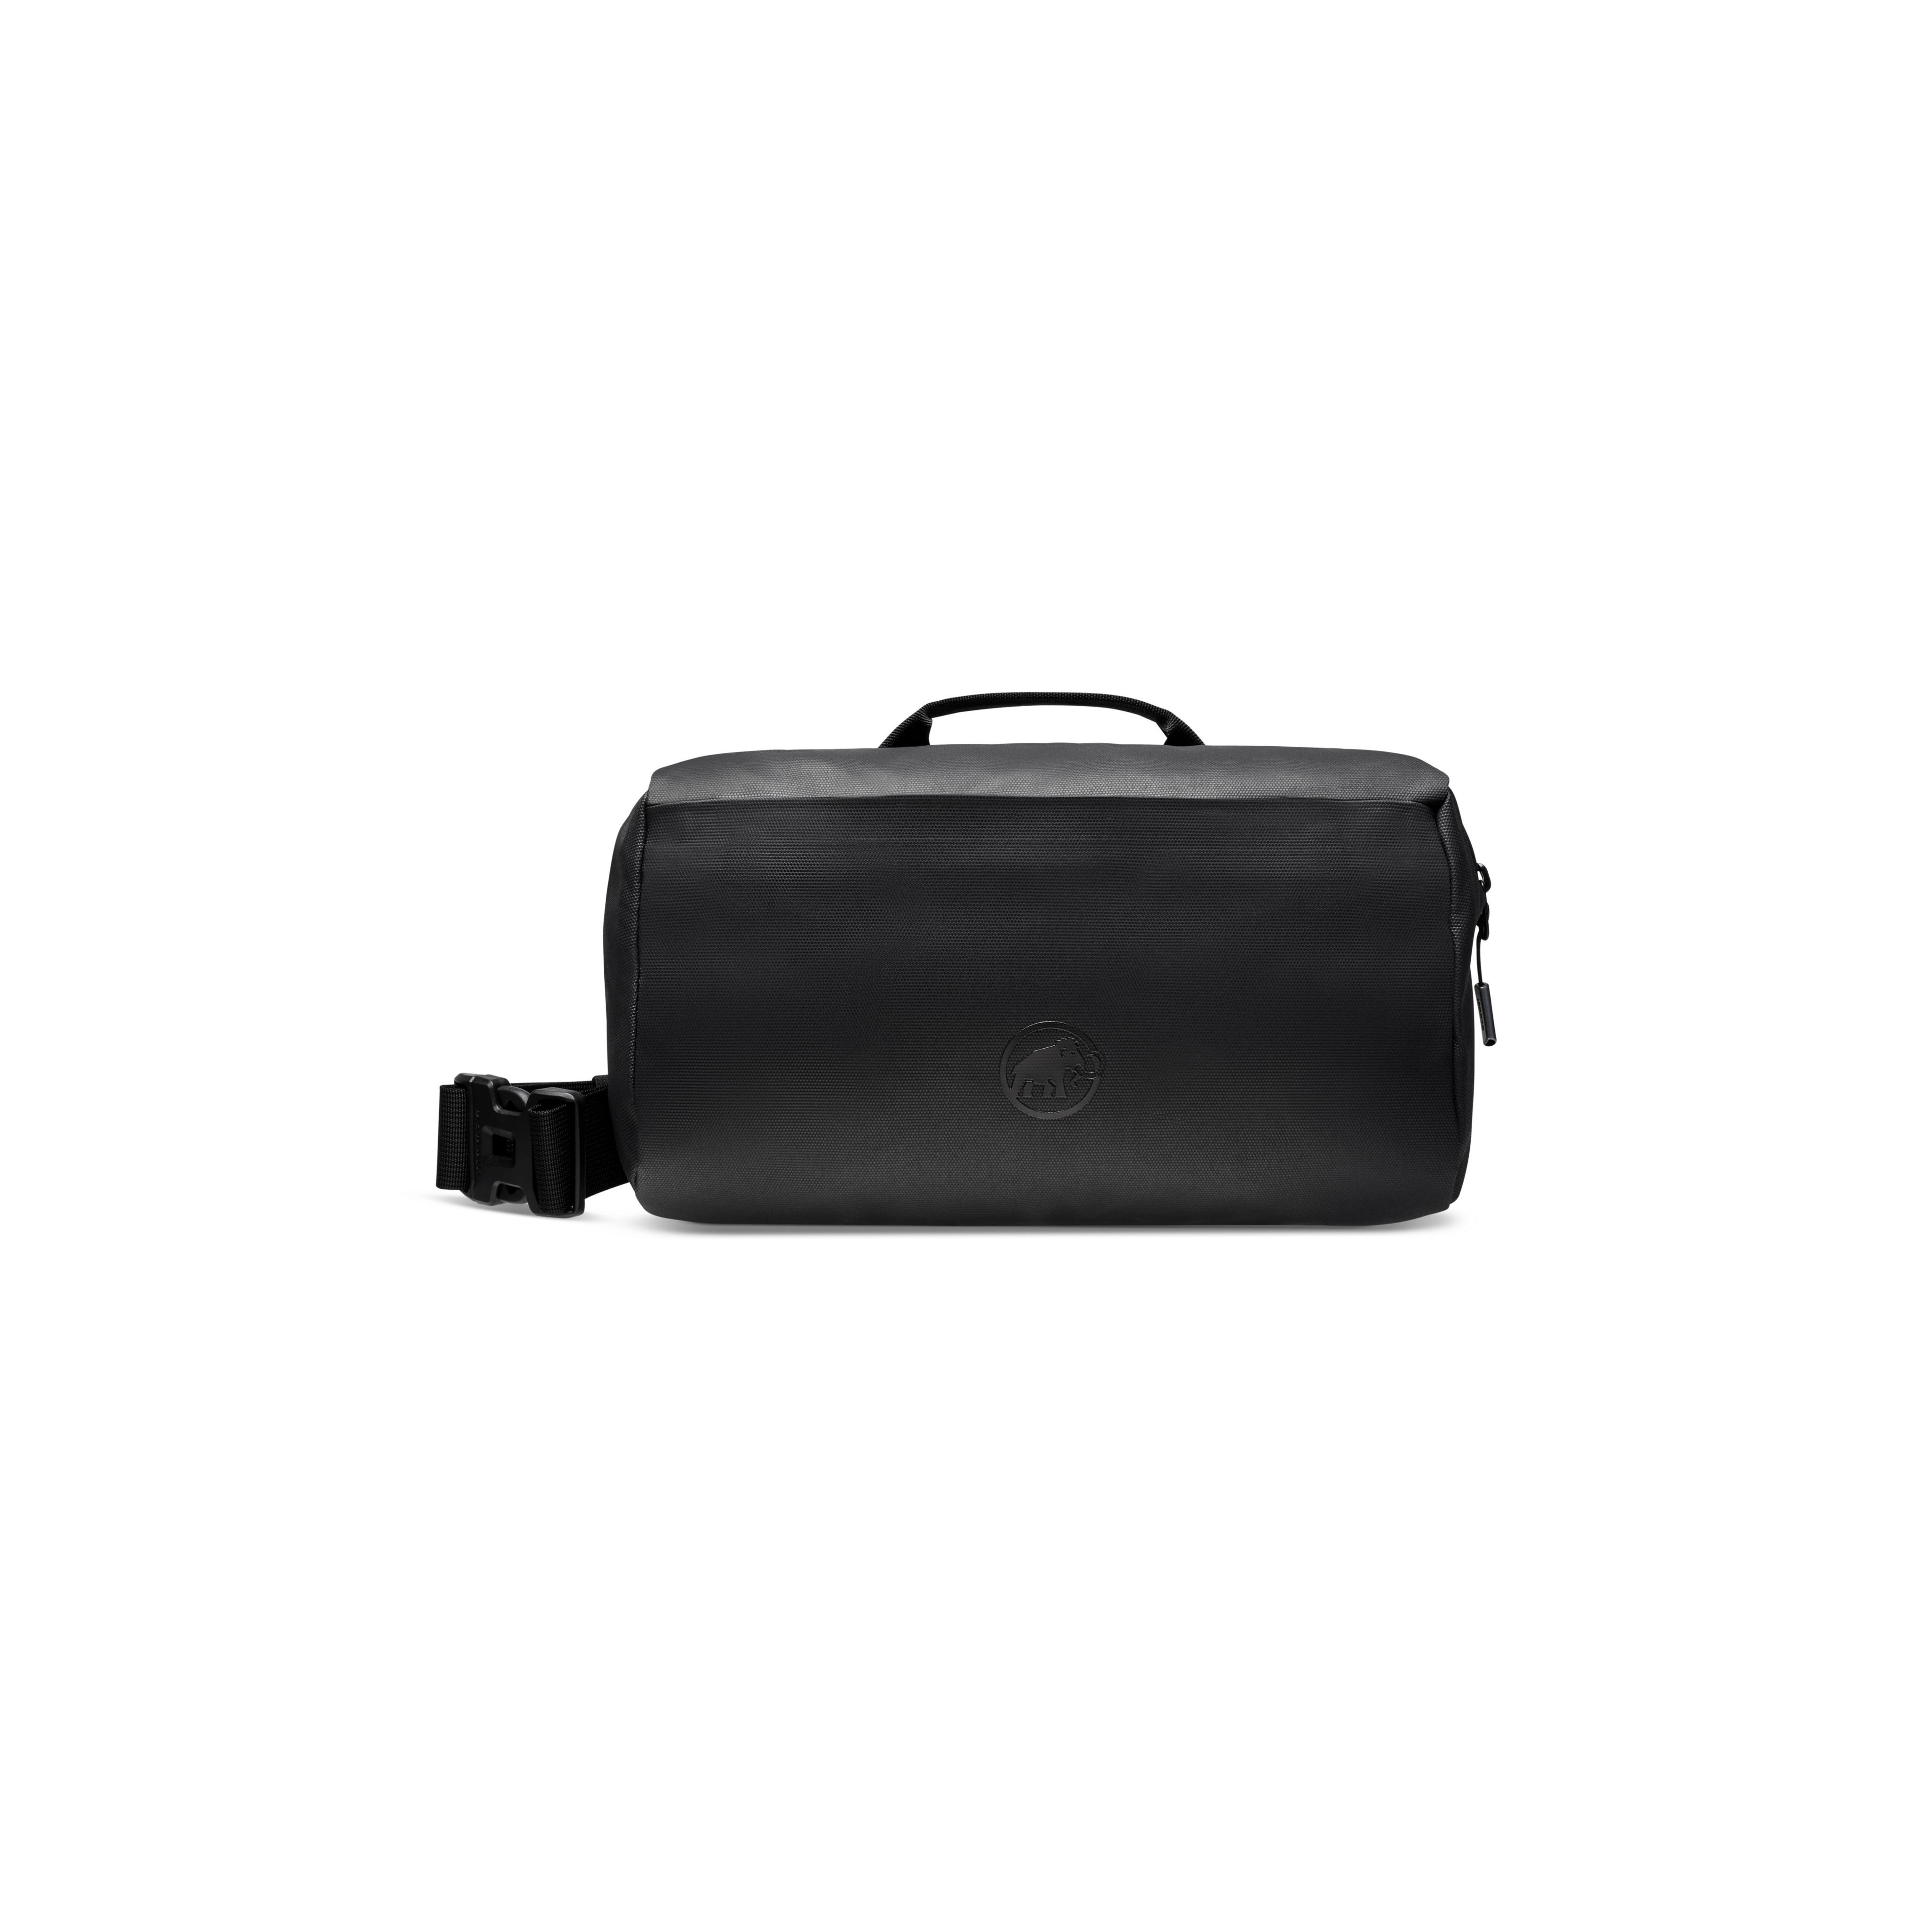 Seon 2-Way Waistpack - 4 L, black product image